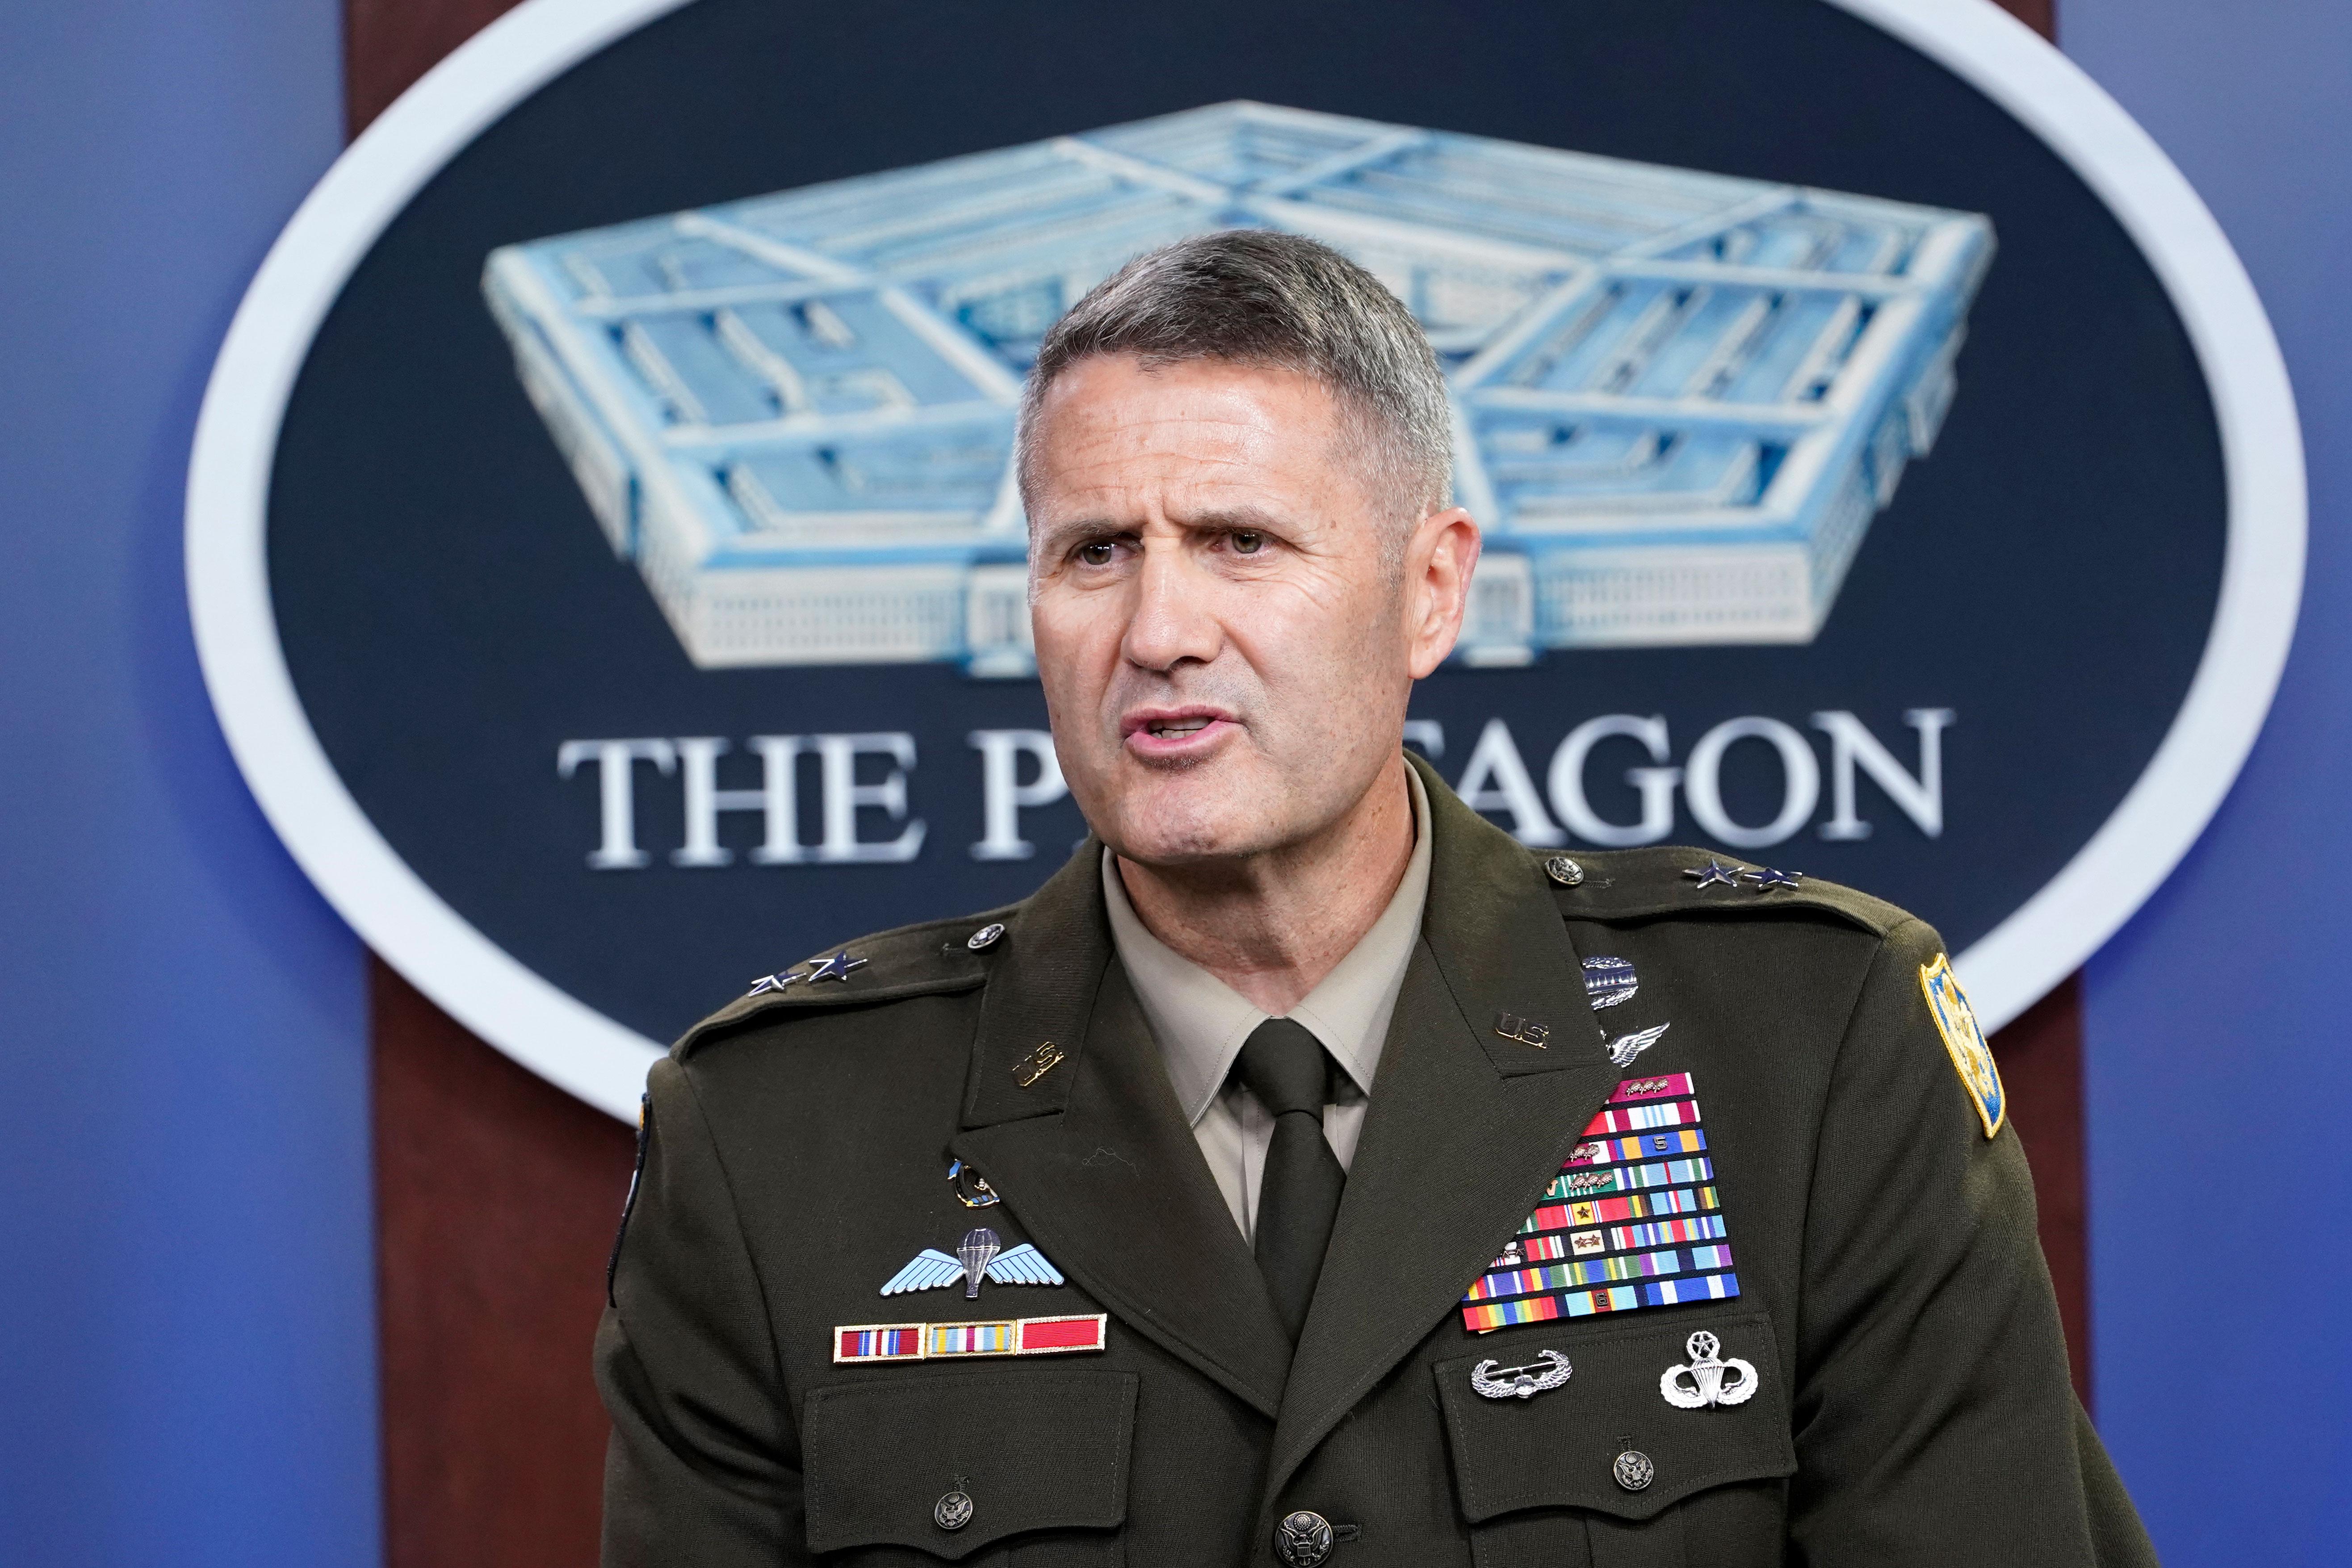 Maj. Gen. Hank Taylor speaks during a briefing in Washington, DC, on August 28, 2021.